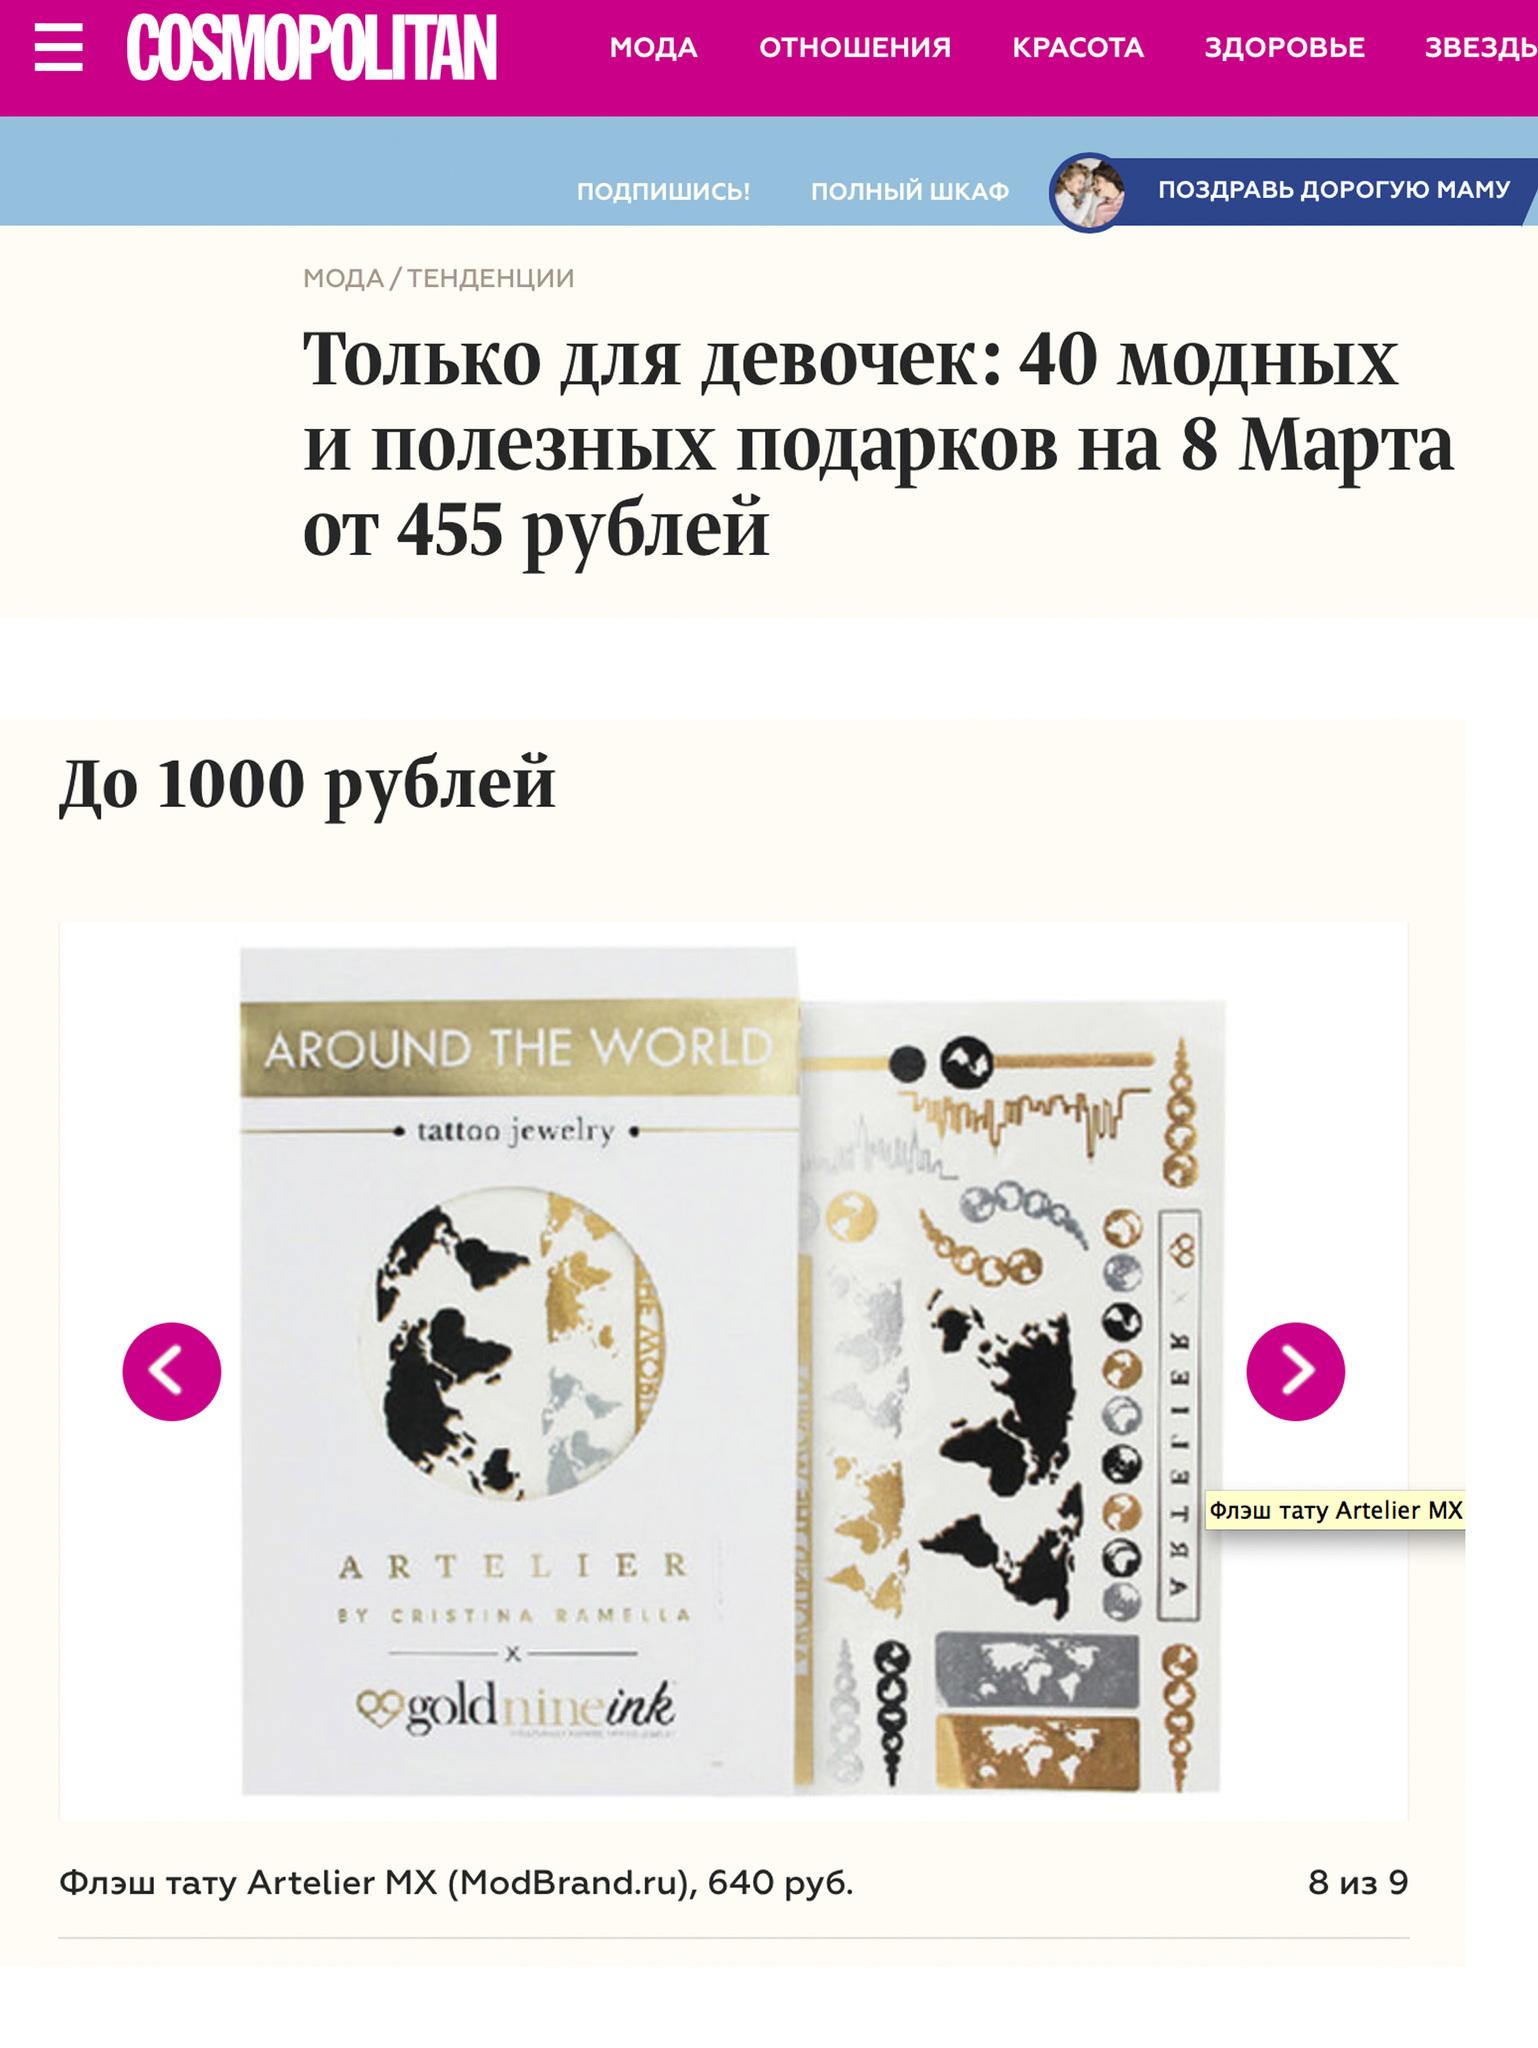 Колье In Riga Red  от Egotique и Флэш-тату World Tattoo от Artelier MX на Cosmo.ru